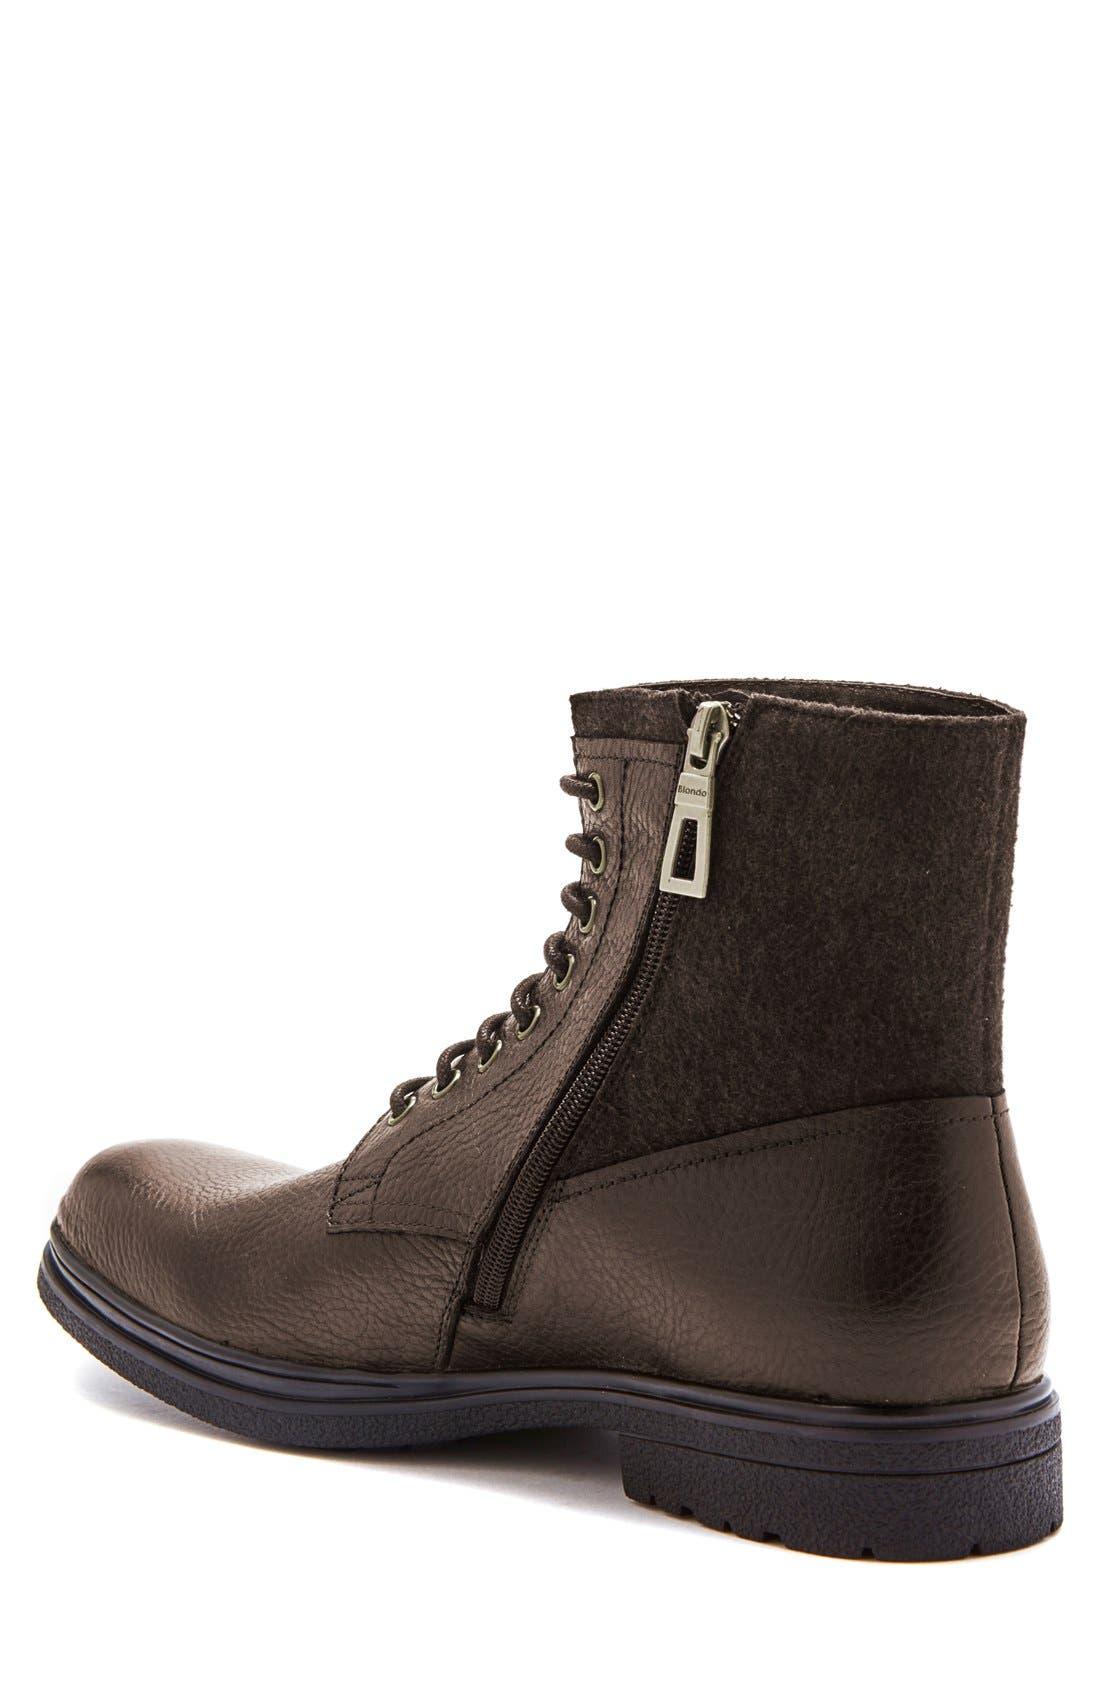 'Backoff' Waterproof Plain Toe Boot,                             Alternate thumbnail 2, color,                             200